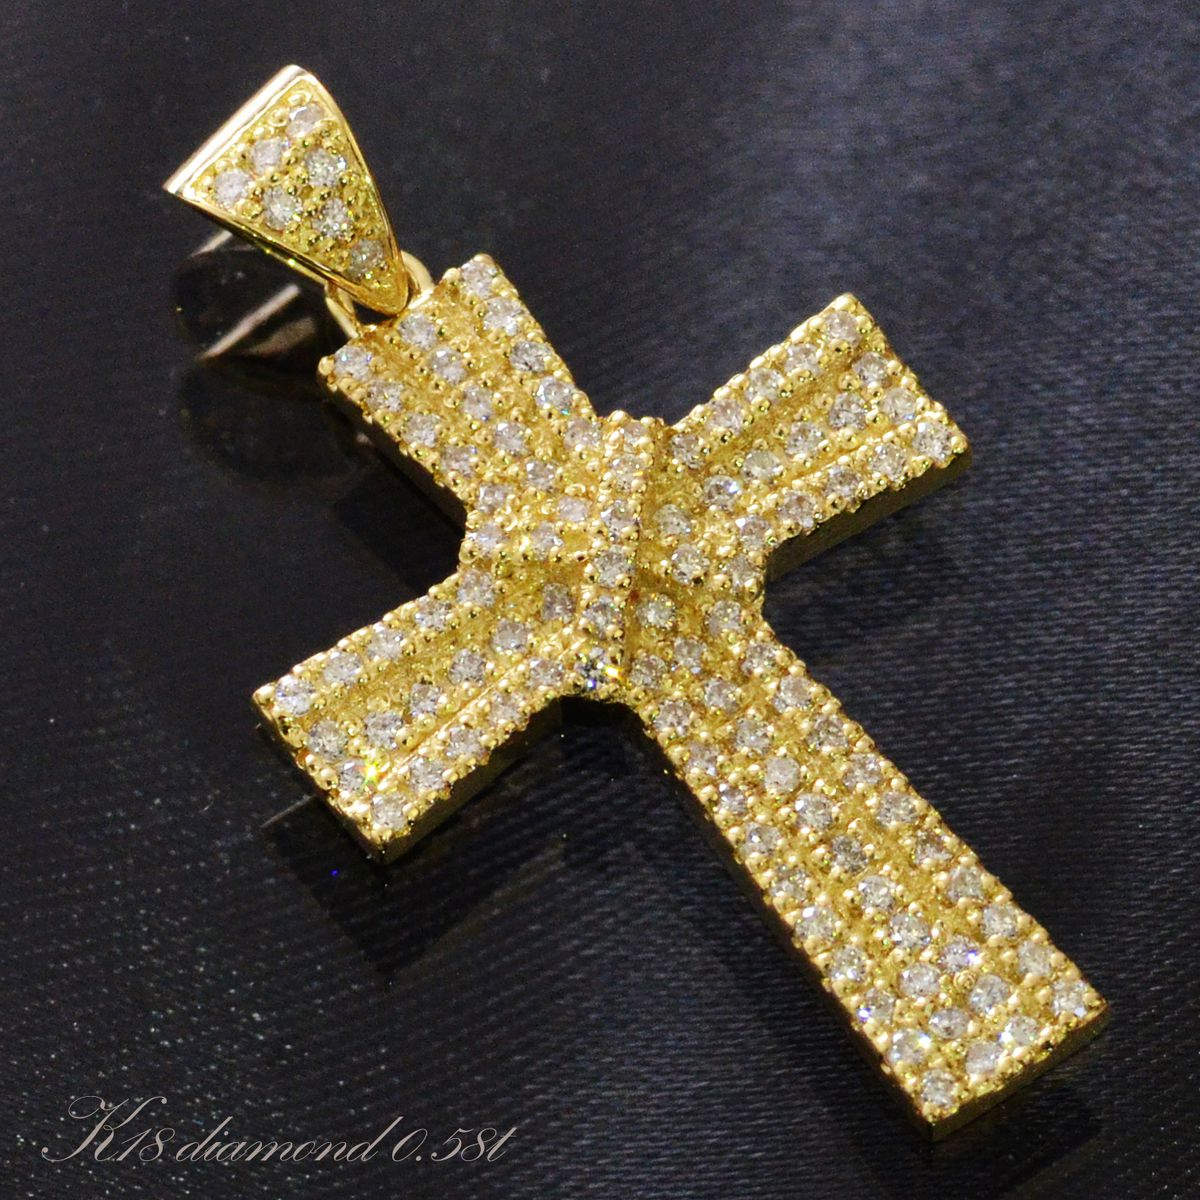 K18 ダイヤモンド クロス ペンダントトップ メンズ/送料無料